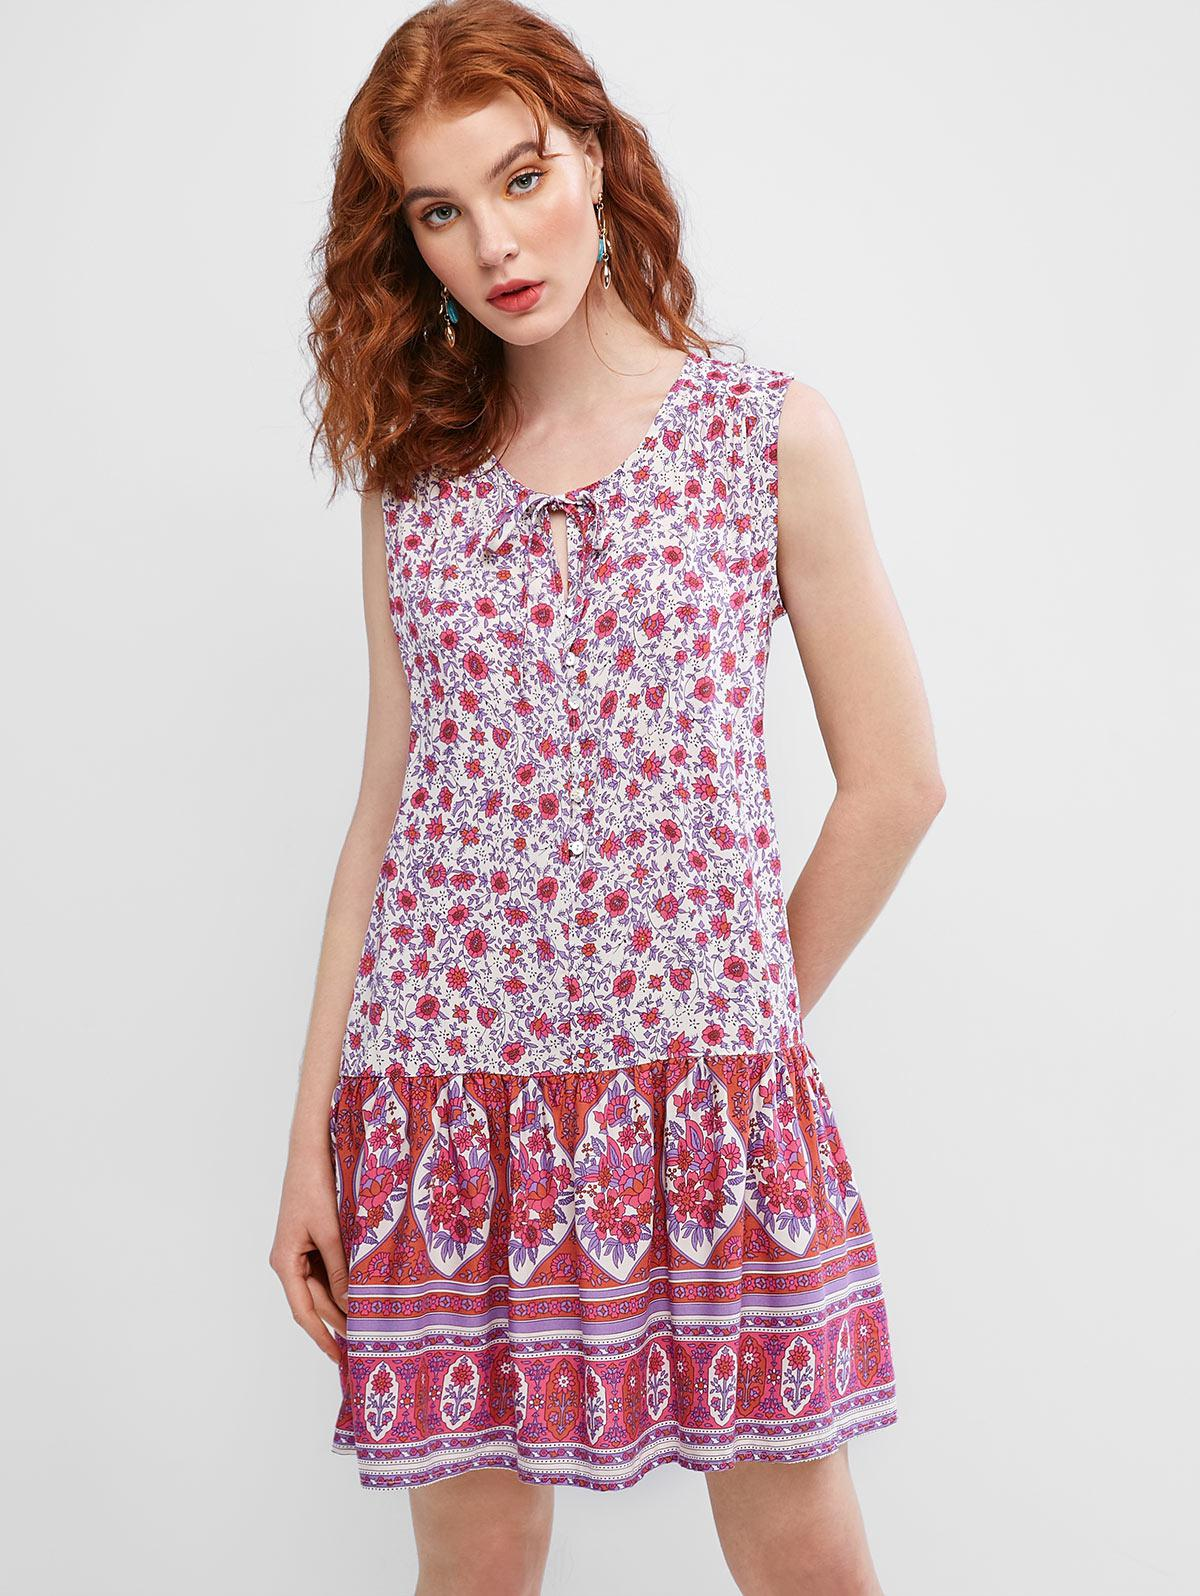 Sleeveless Floral Tie Collar Mini Dress